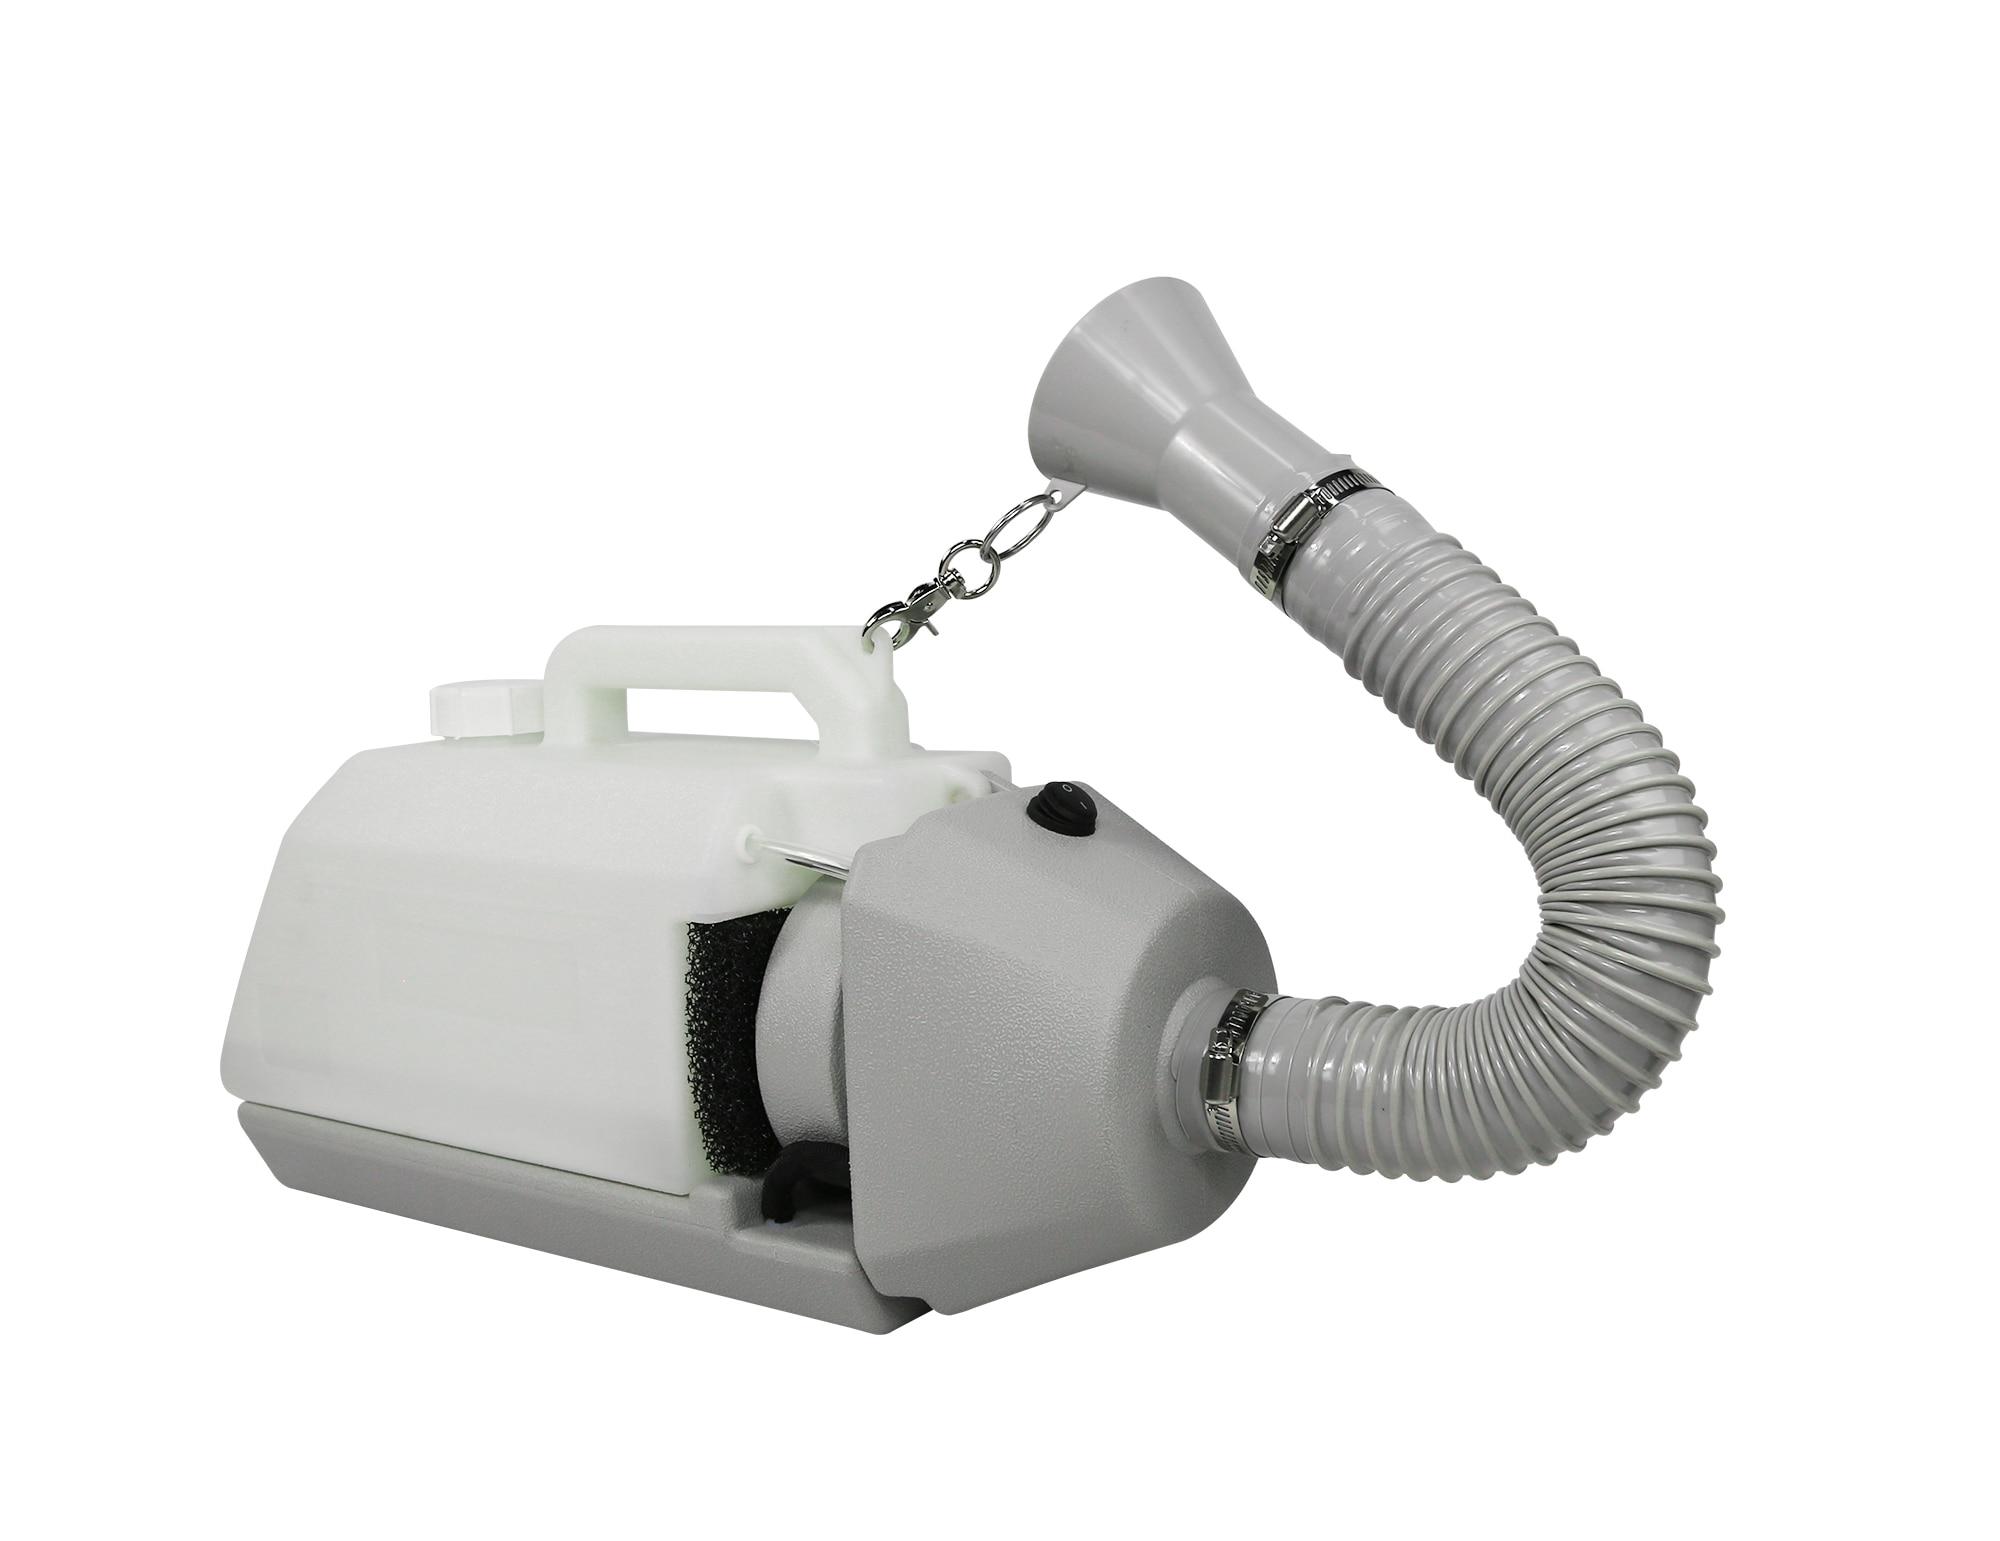 Cordless battery disinfecting sprayer cold ulv fogger sprayer 3L ultra low capacity handheld sanitizer fogging machine